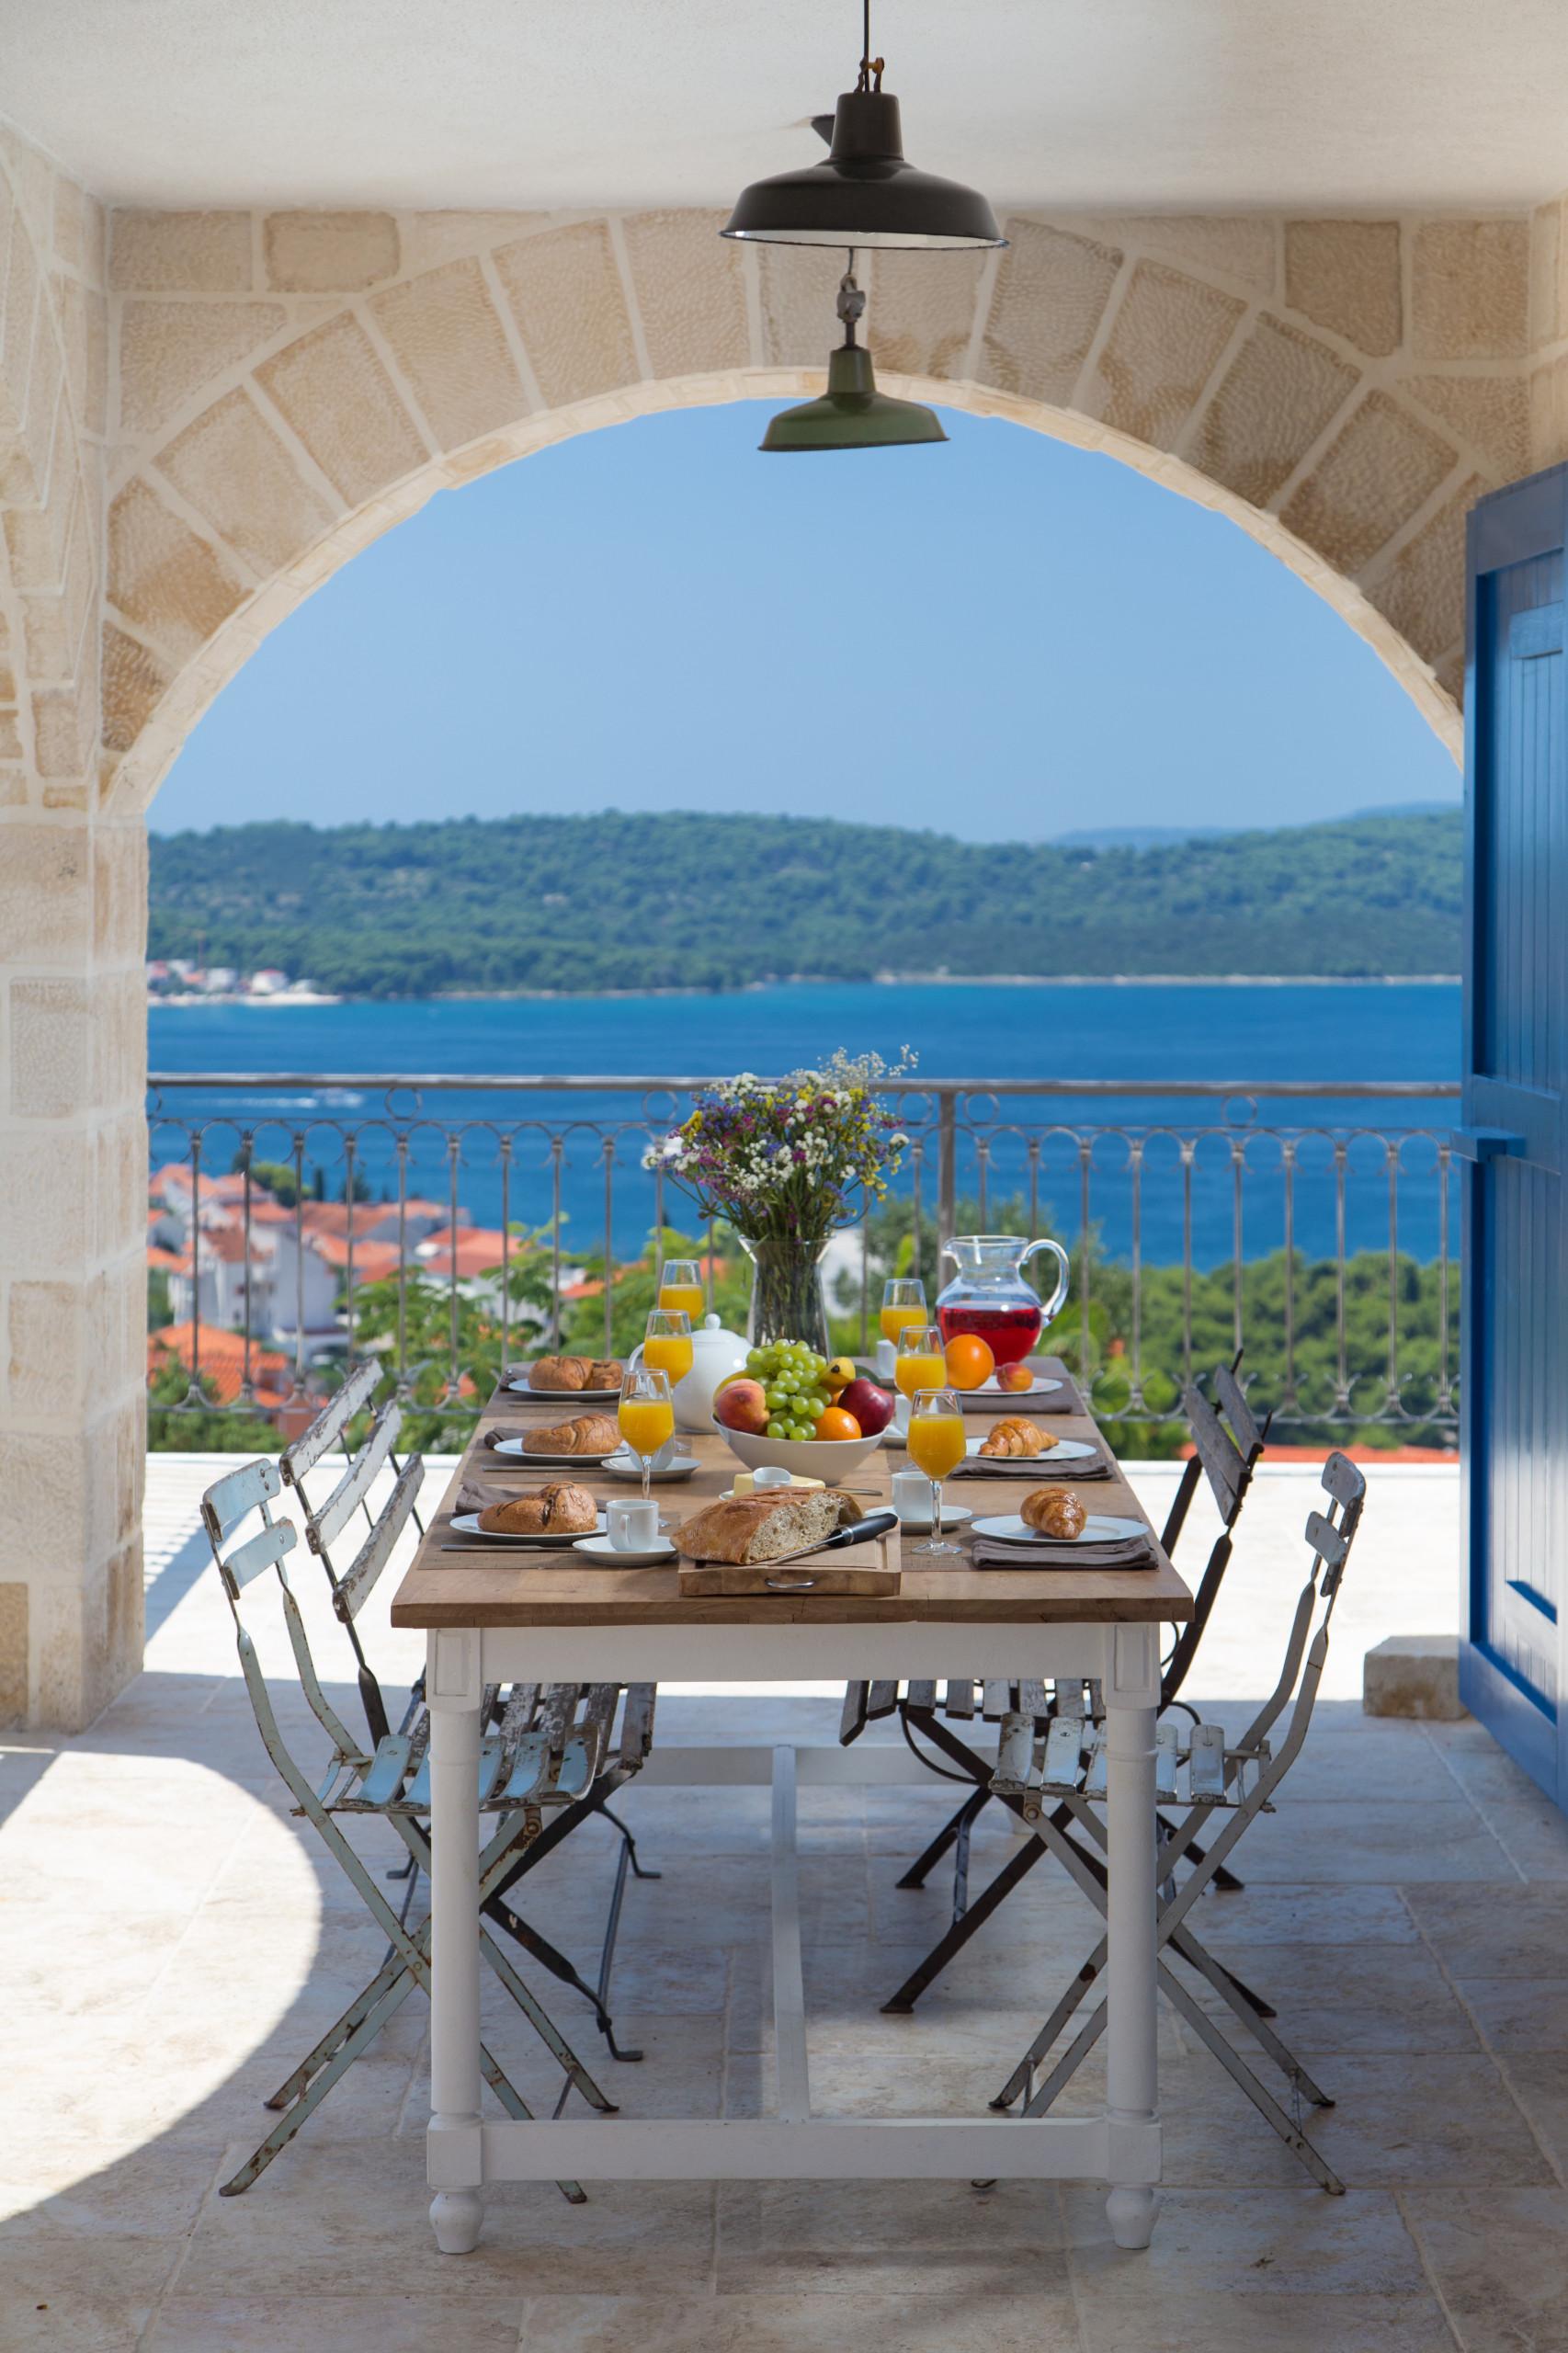 Croatie : Maison de vacances en bord de mer